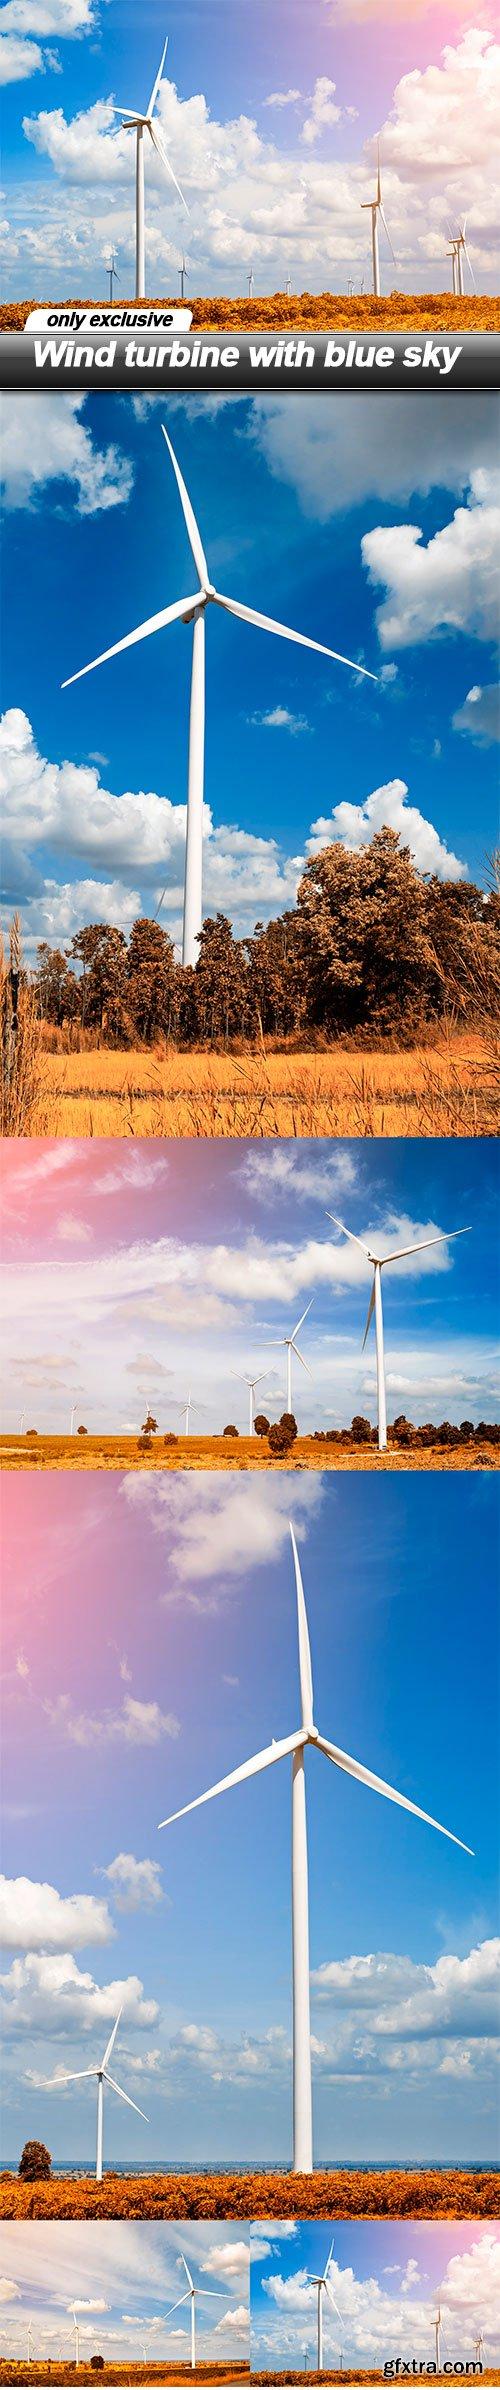 Wind turbine with blue sky - 5 UHQ JPEG